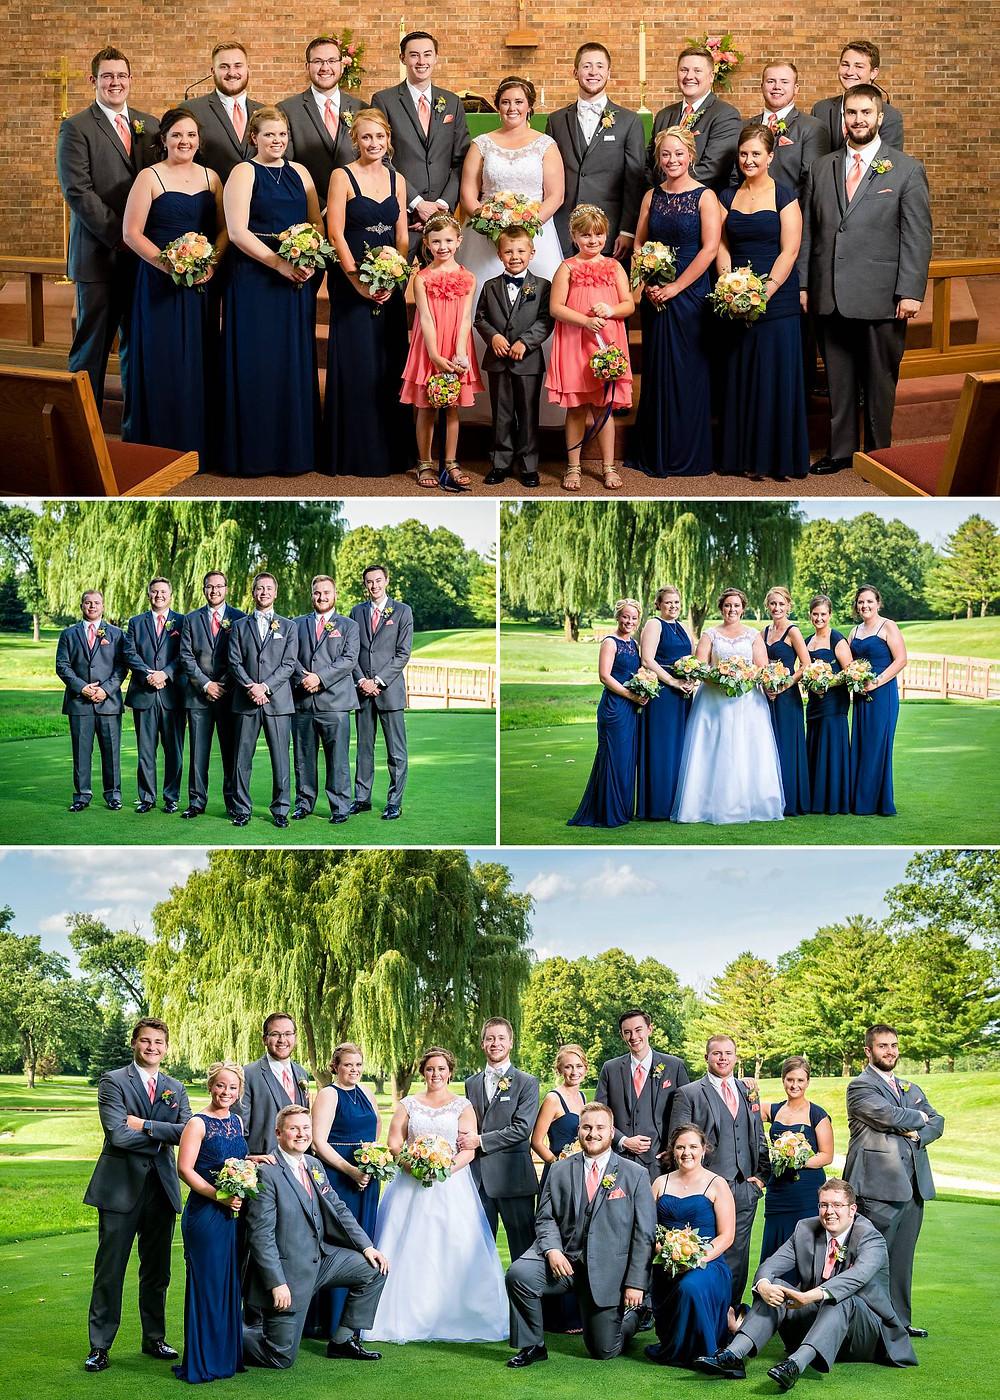 Oshkosh Wisconsin Bridal Party Photos | Lanari Photography